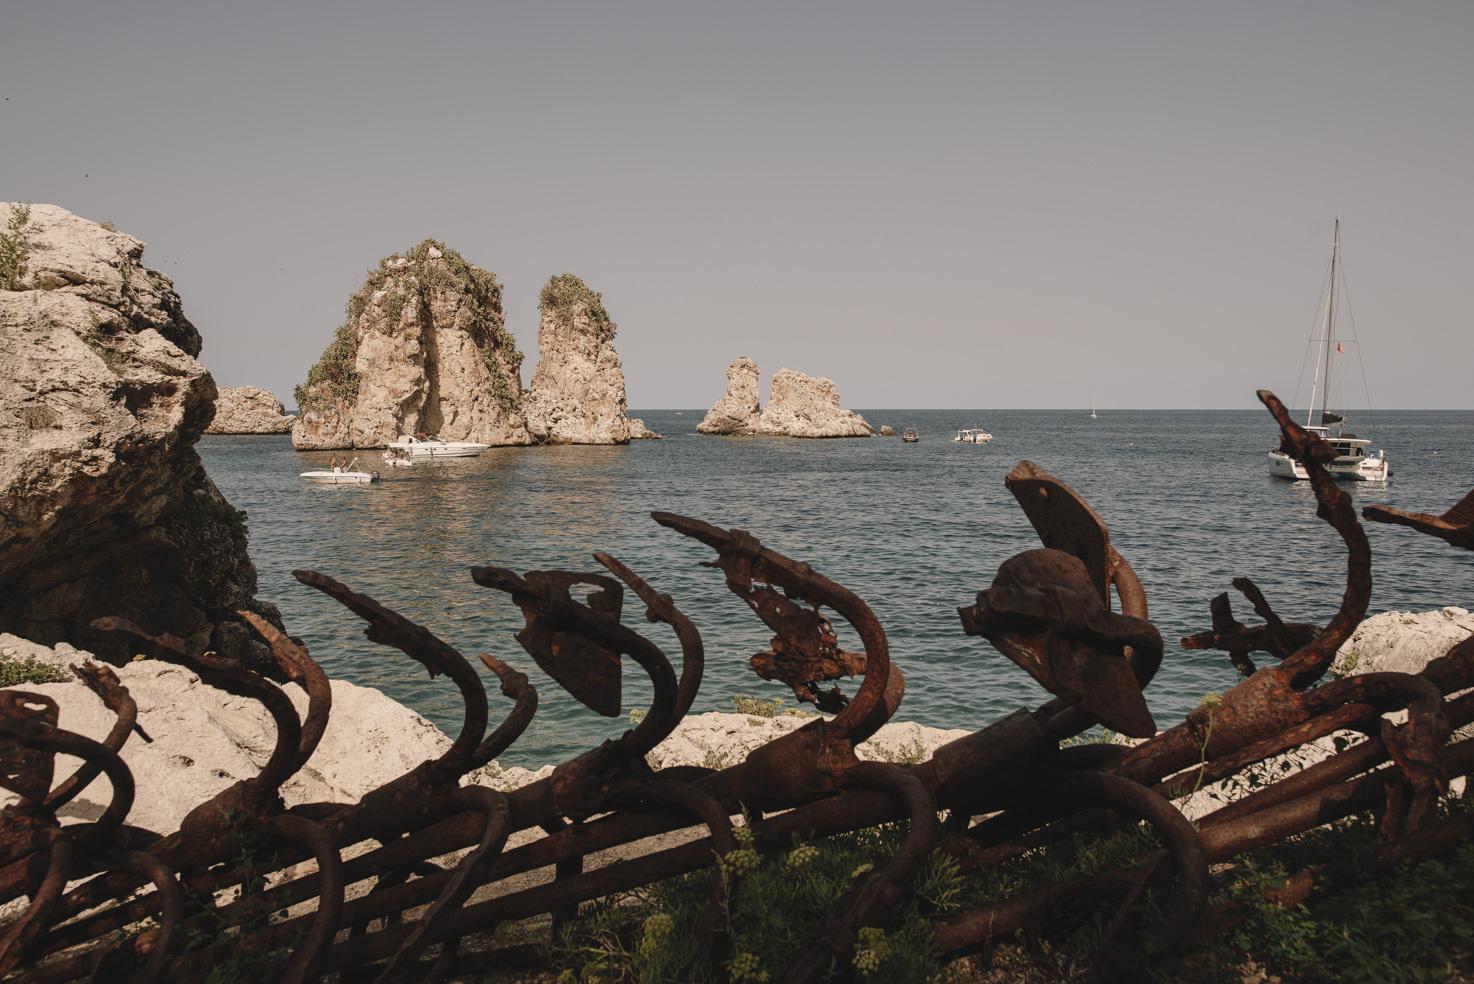 Mediterranean Sea in front of Tonnara di Scopello